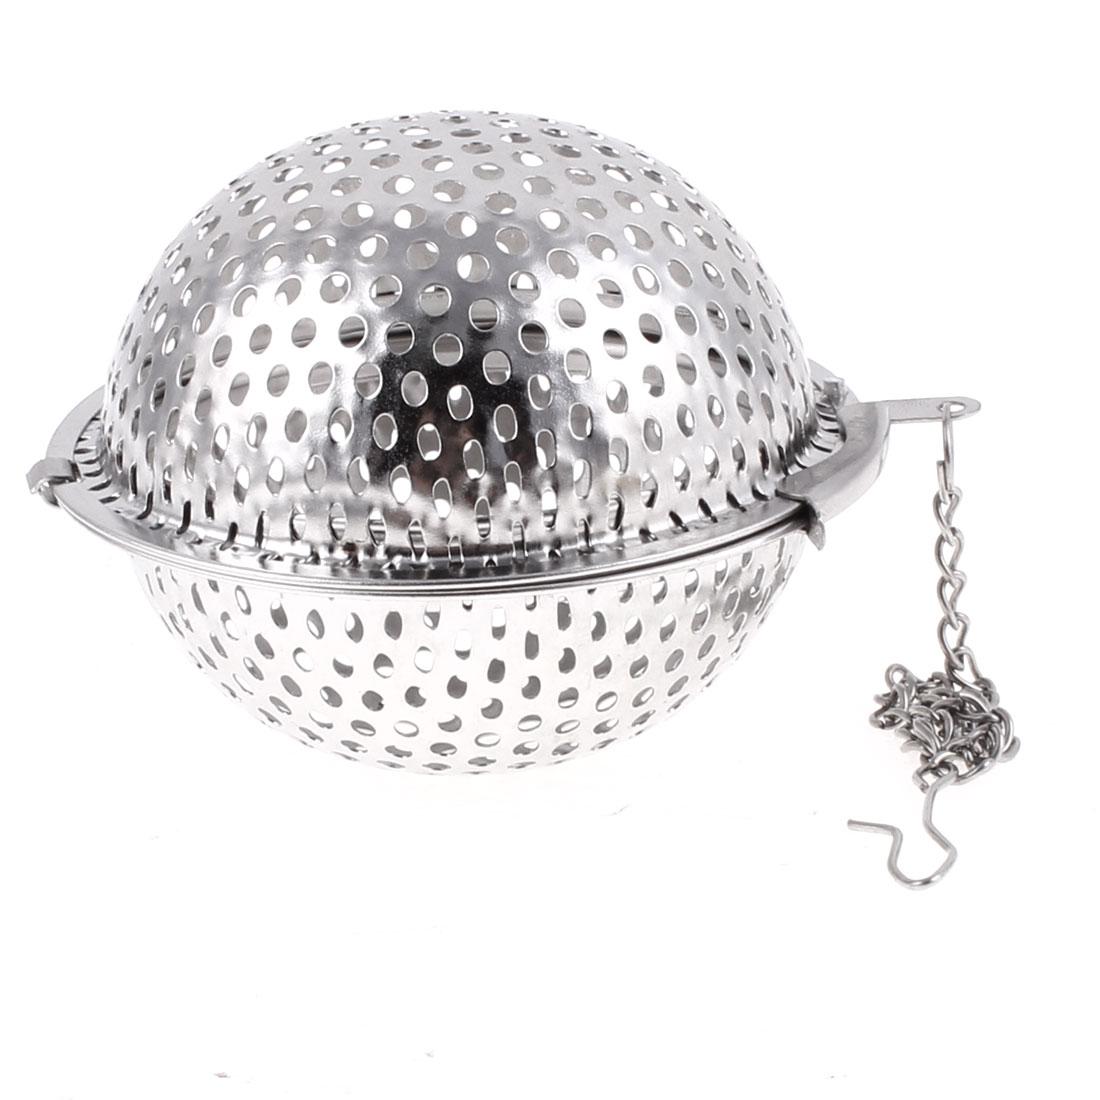 Home Aluminum Spherical Design Snap Infuser Filter Tea Strainer